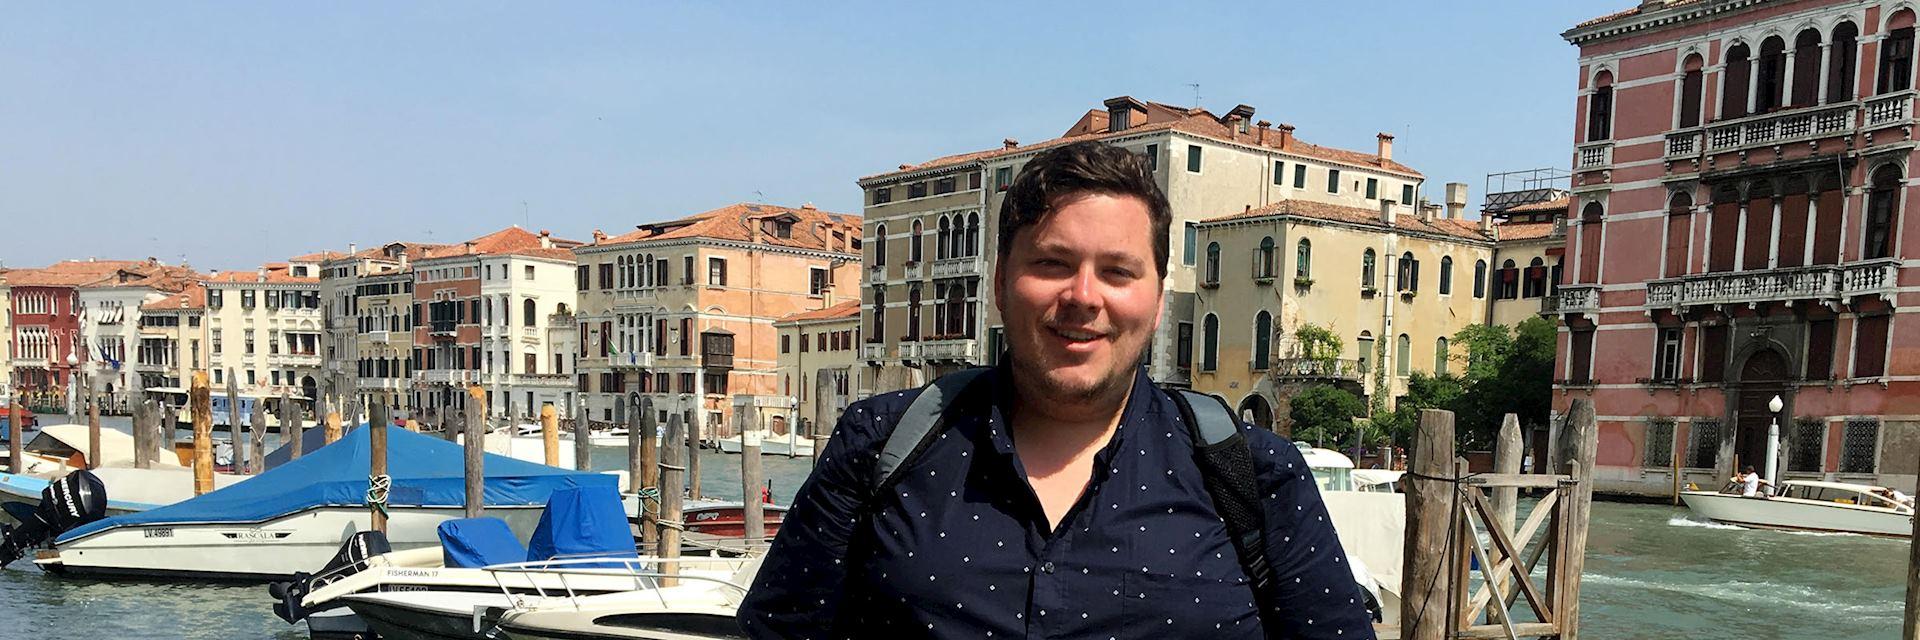 Brandon on the Grand Canal, Venice, Italy